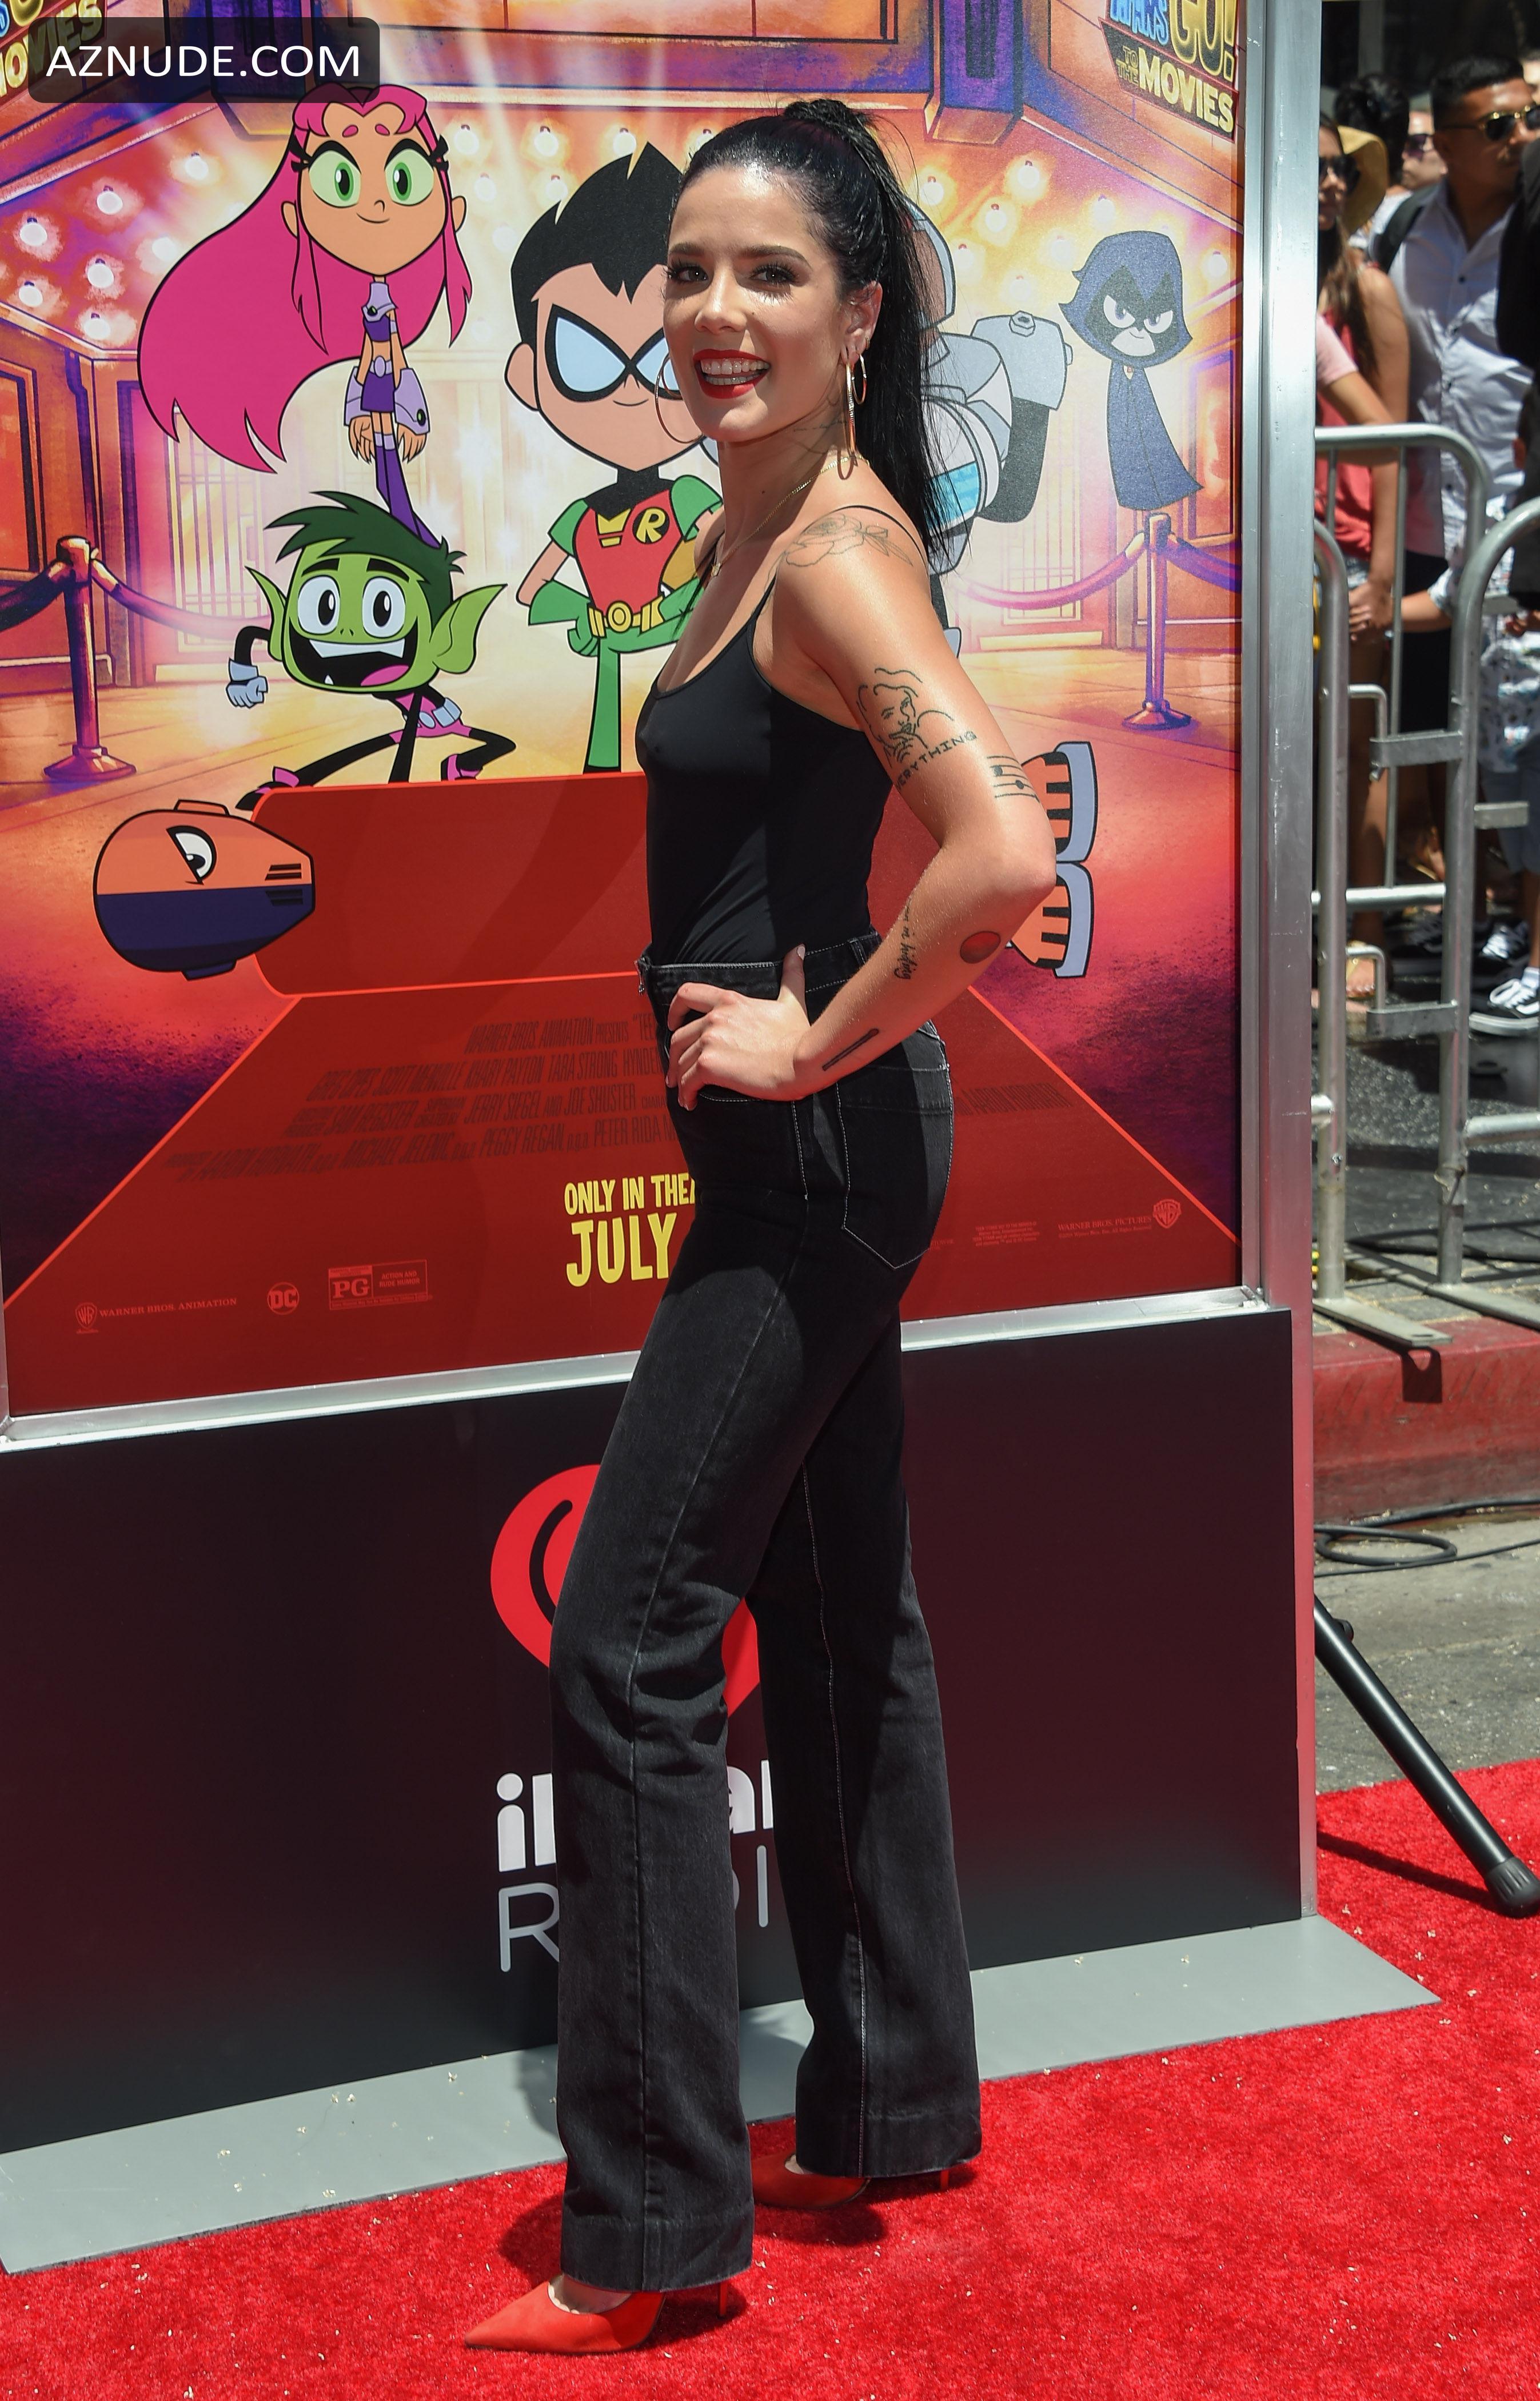 XXX Samantha Bentley naked (25 foto and video), Tits, Bikini, Boobs, braless 2020